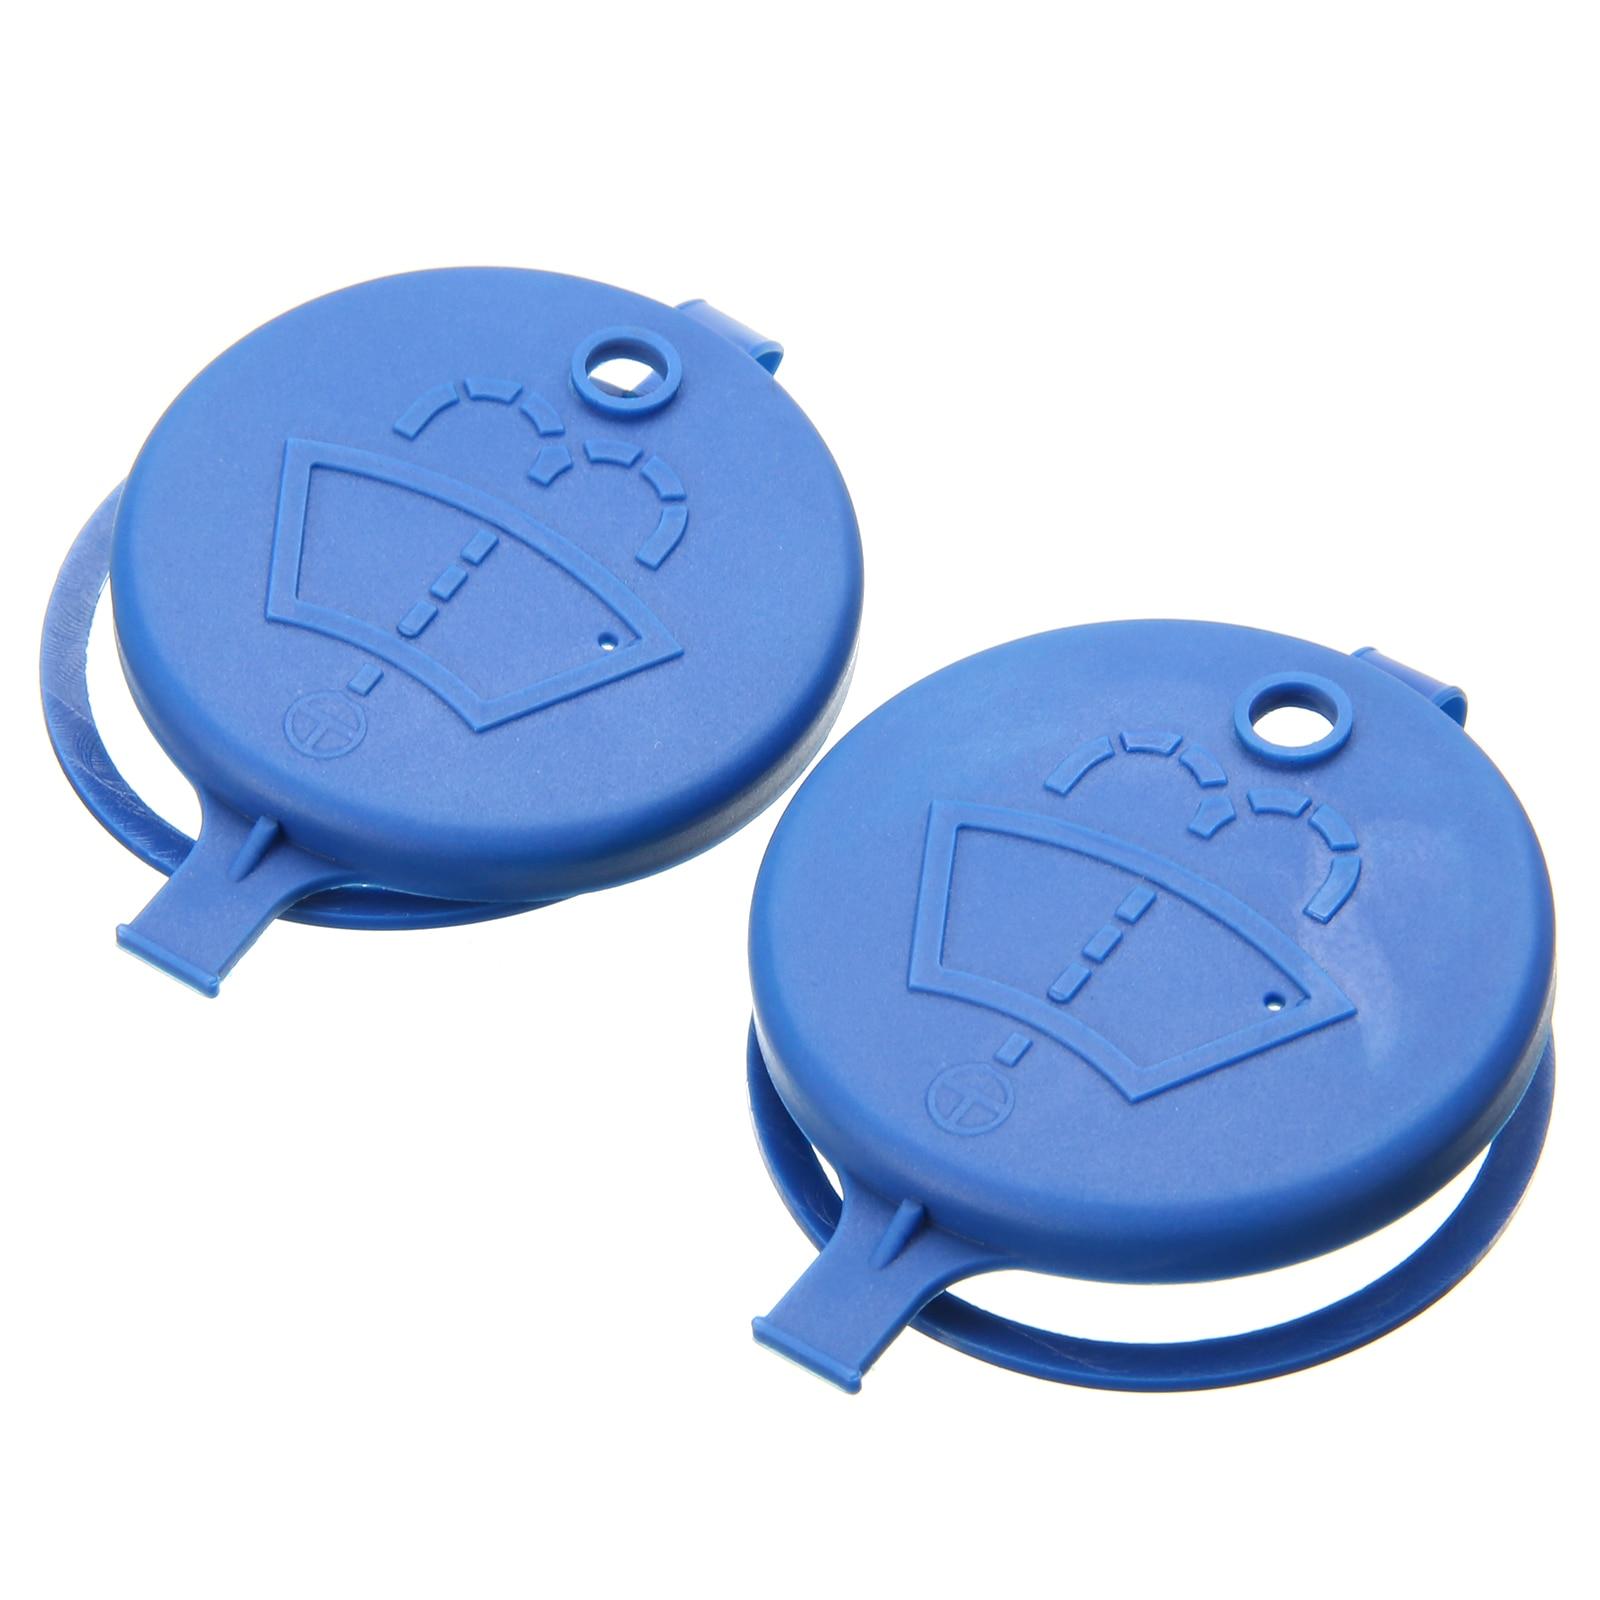 2x Car Fluid Reservoir Tank Bottle Cap For Peugeot 106 206 207 307 Citroen C2/C-Elysee/Xsara/Picasso Windshield Wiper Washer